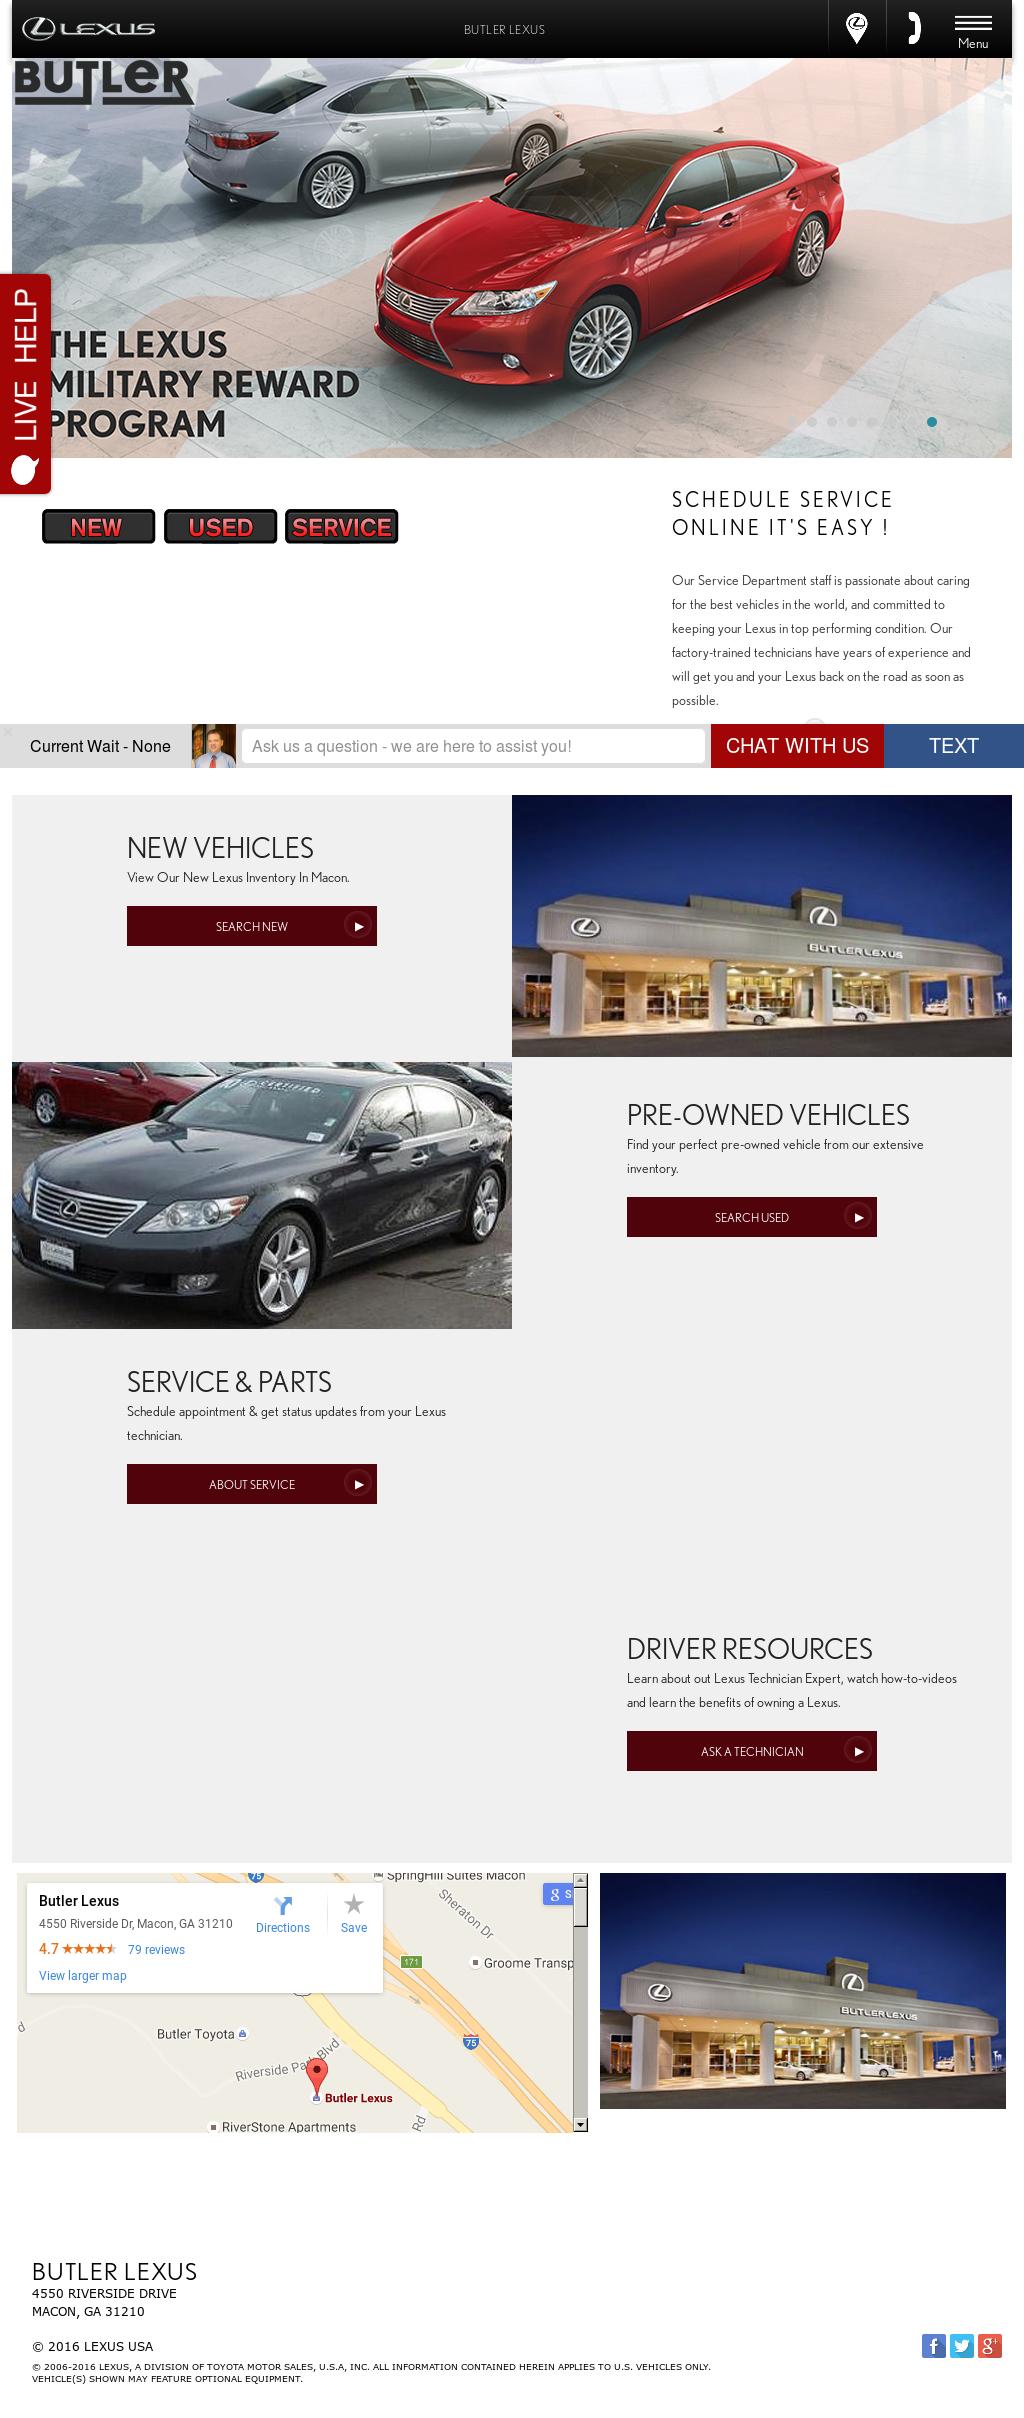 Butler Lexus Macon Ga >> Butler Lexus Competitors Revenue And Employees Owler